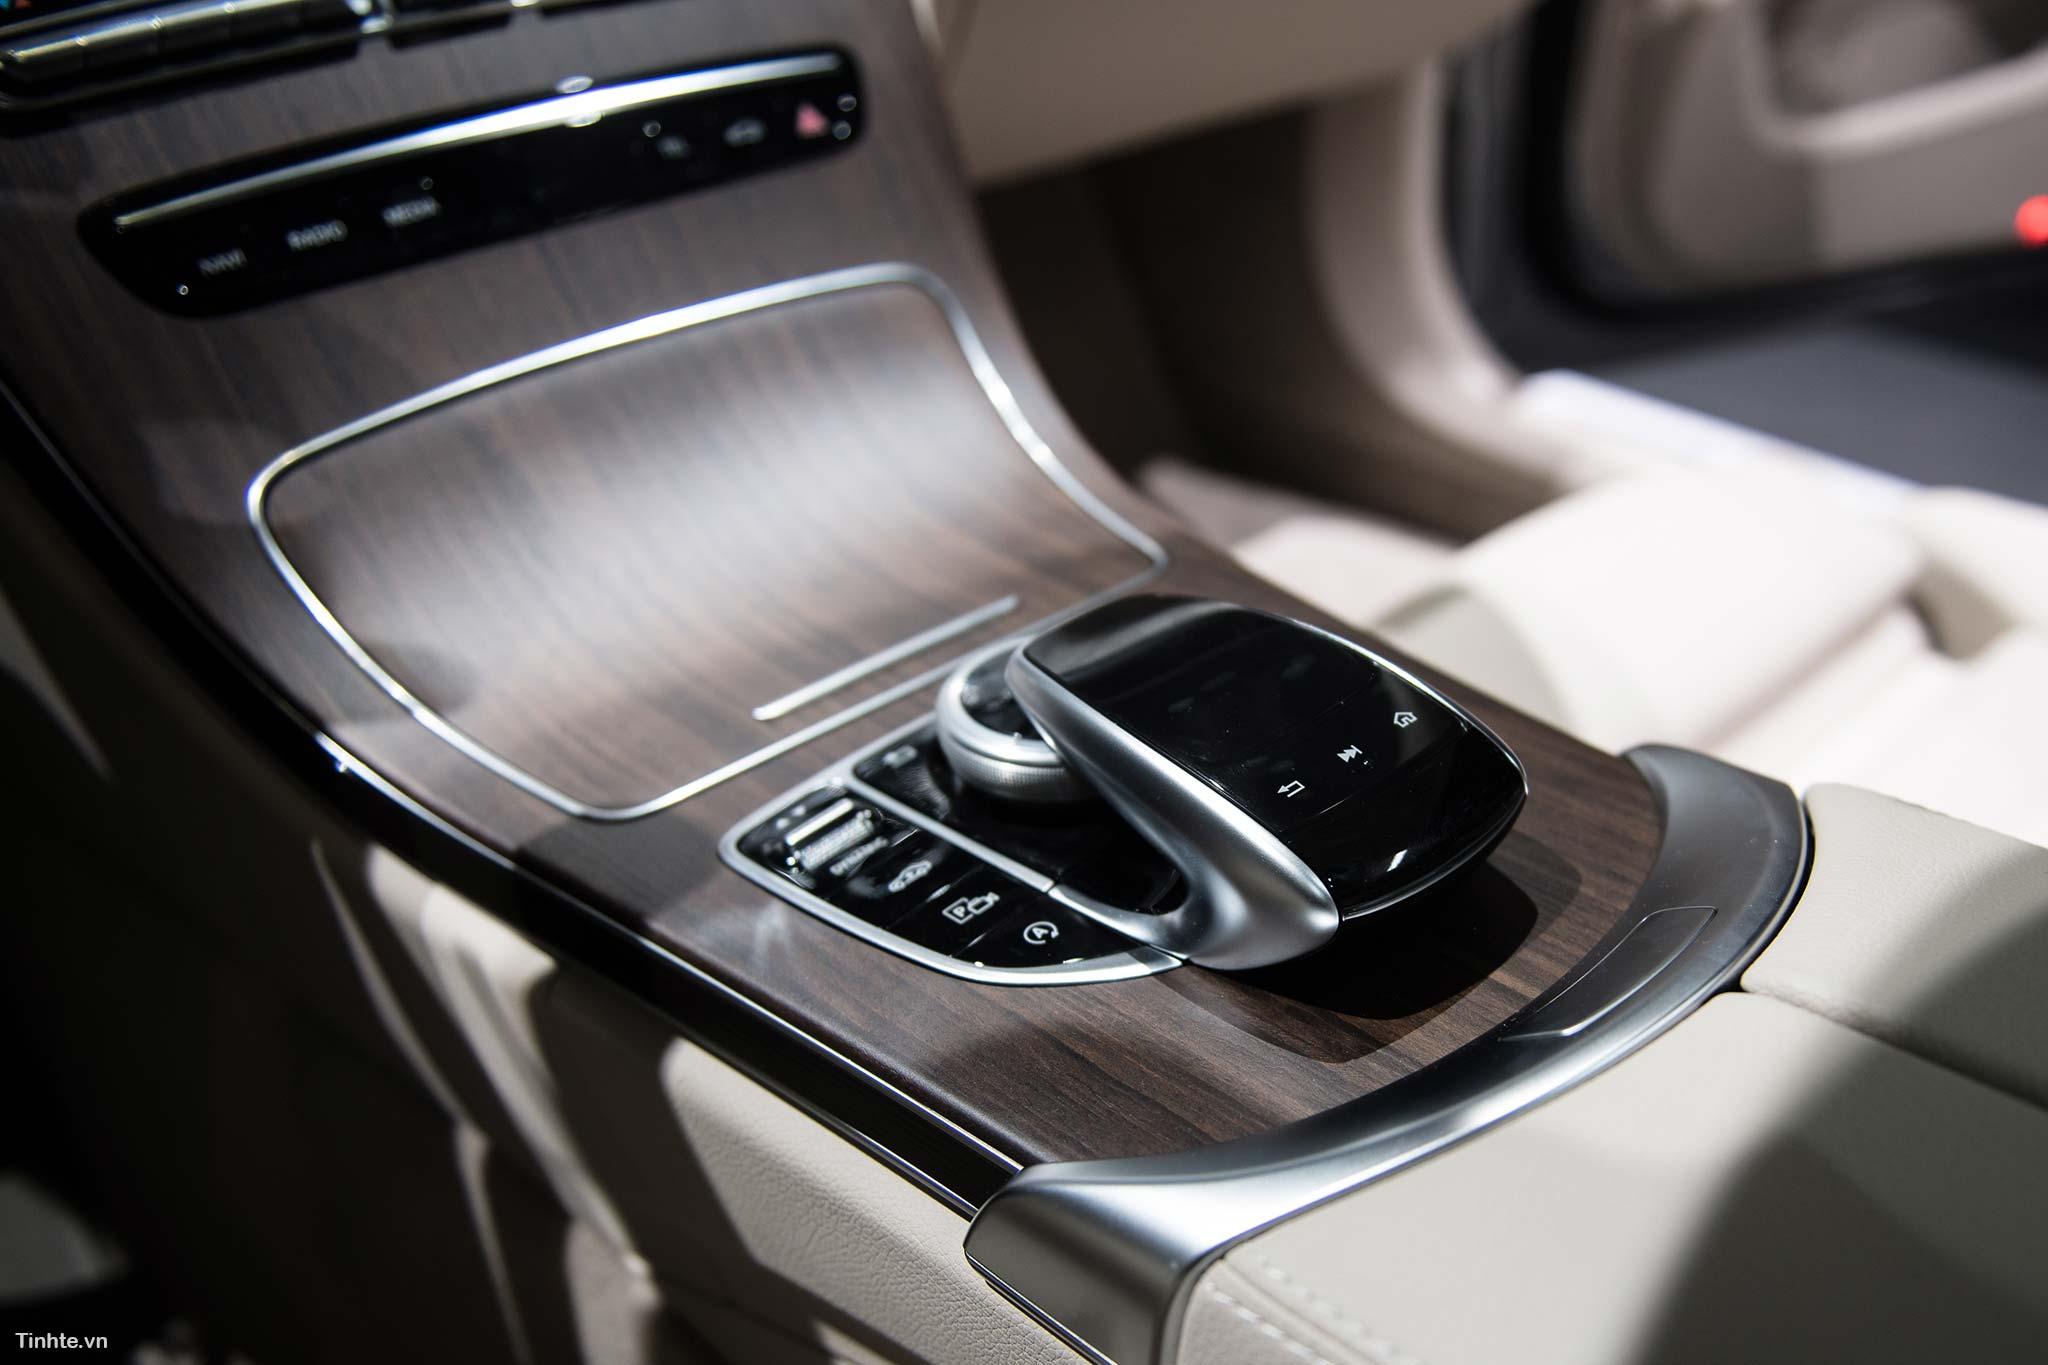 tinhte_Mercedes-Benz-C-200-4MATIC-29.jpg